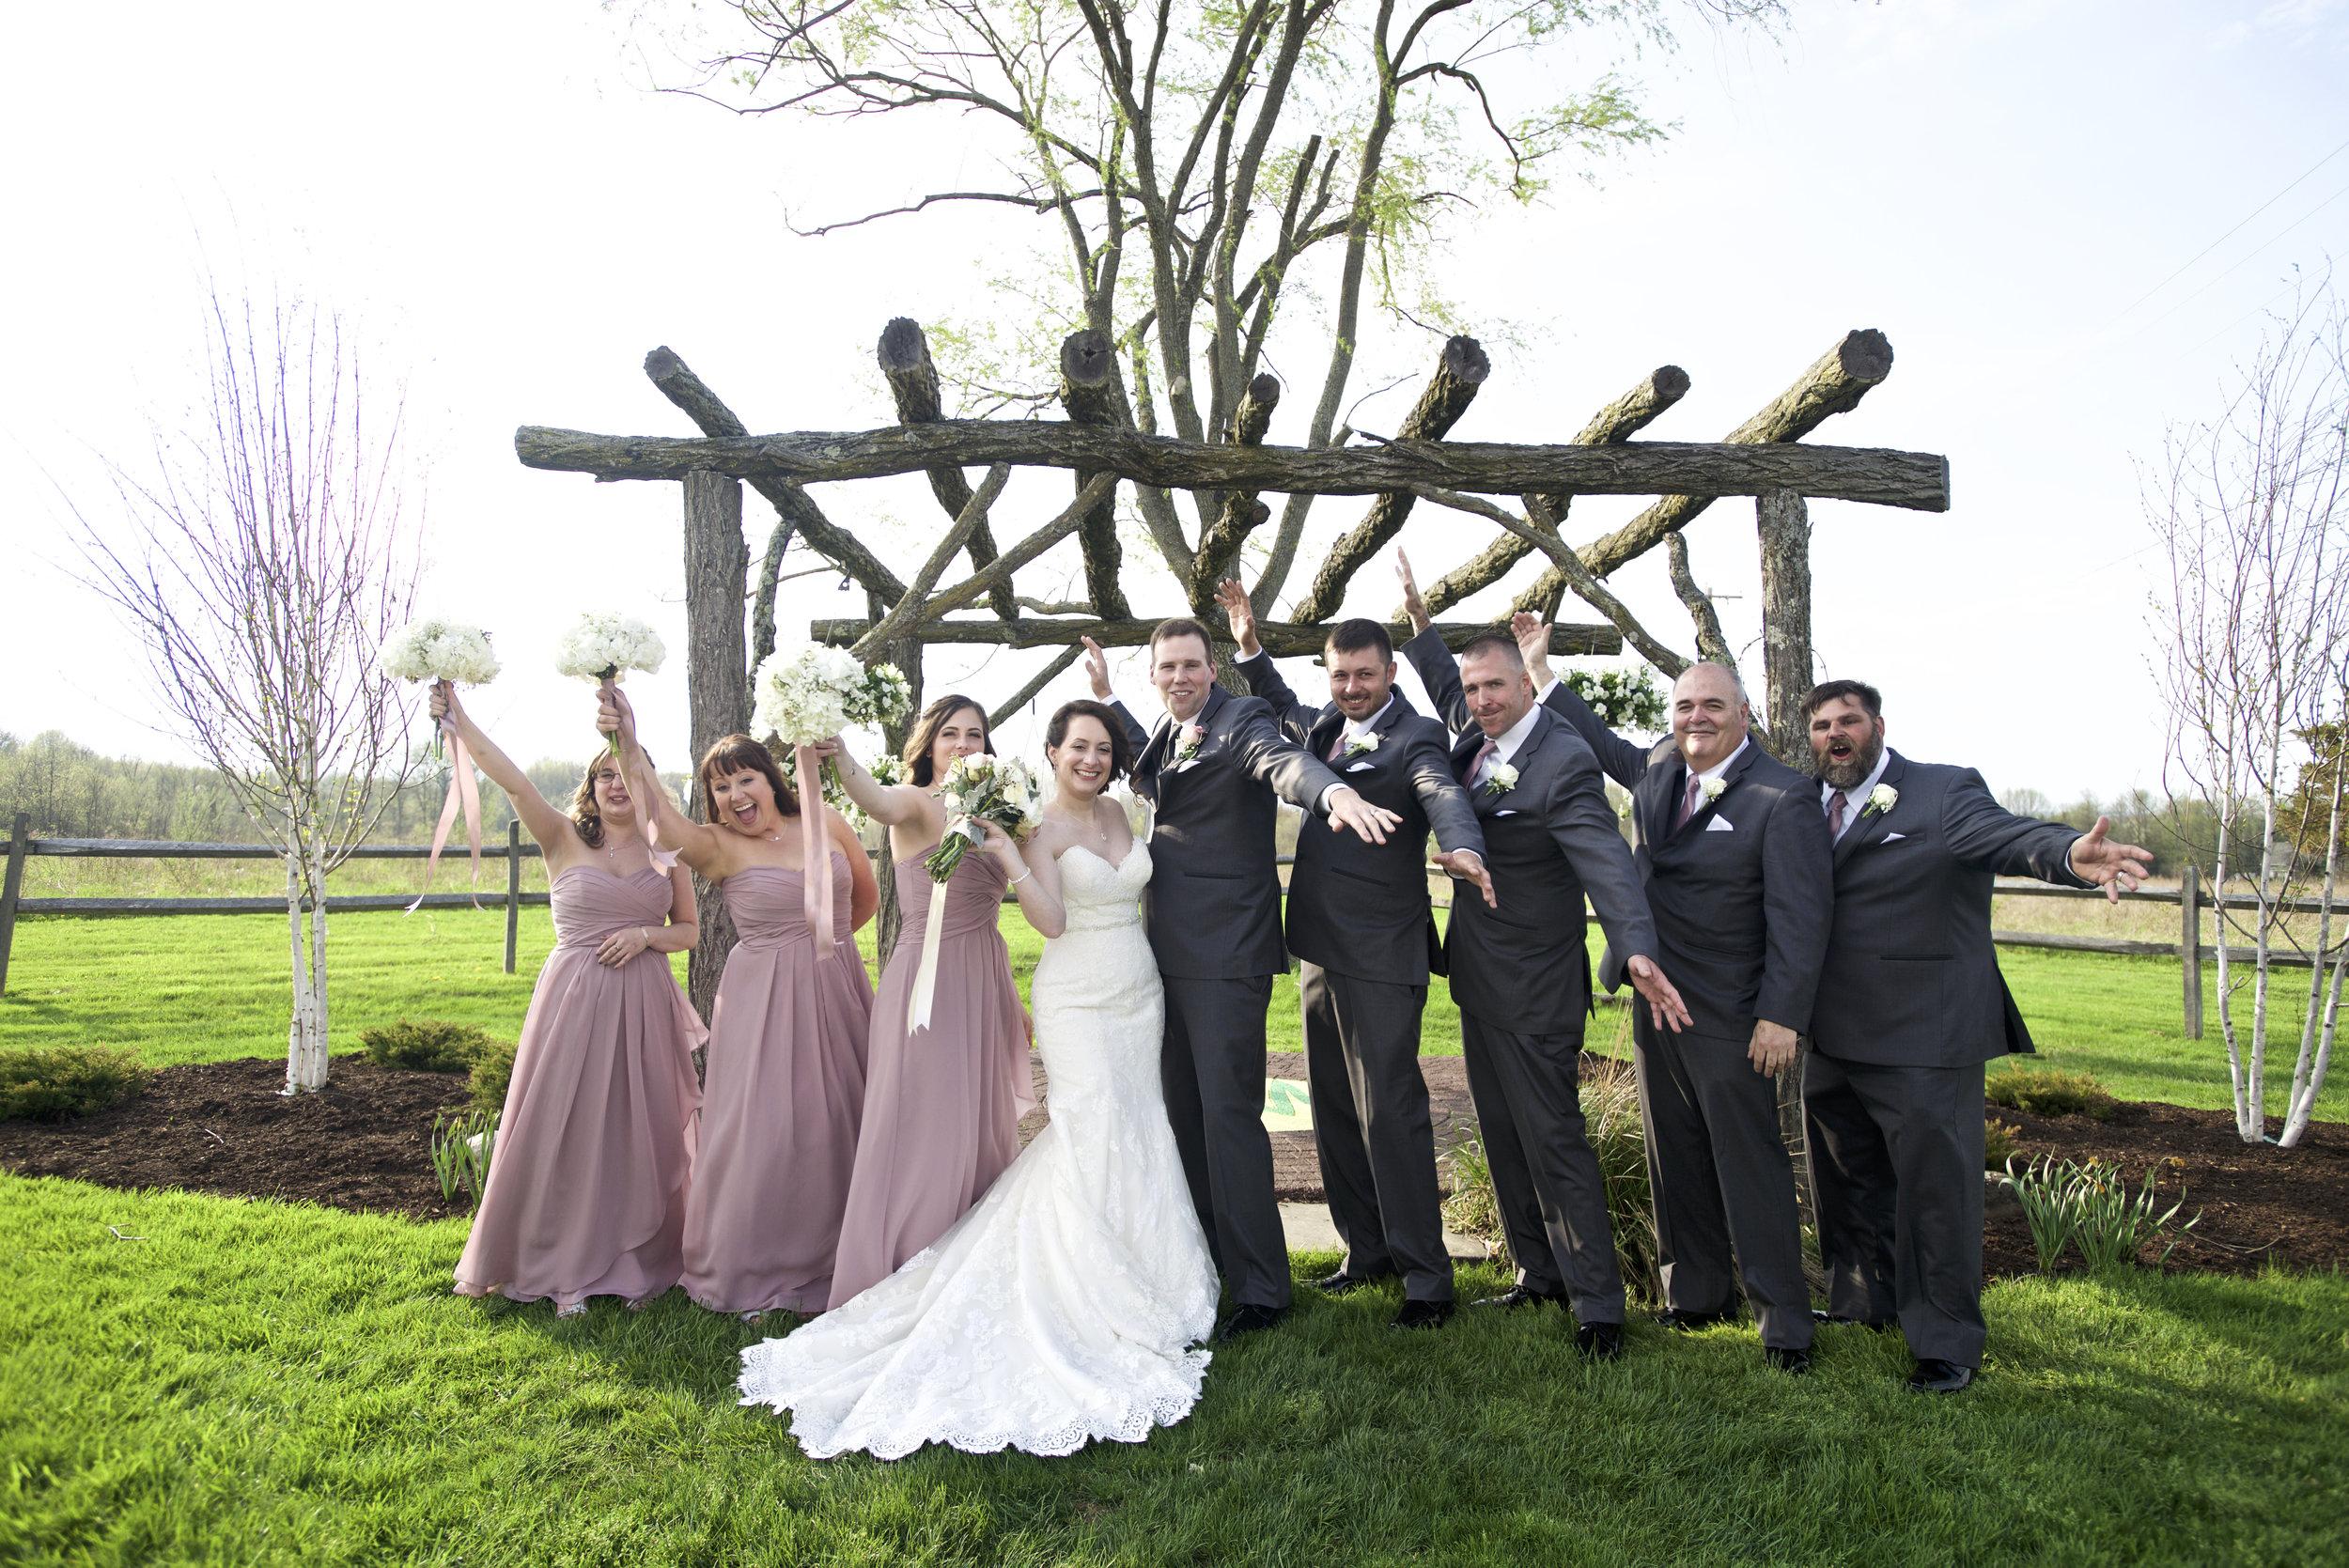 Lippincott manor wedding, wallkill ny wedding, photography, photos n.jpg